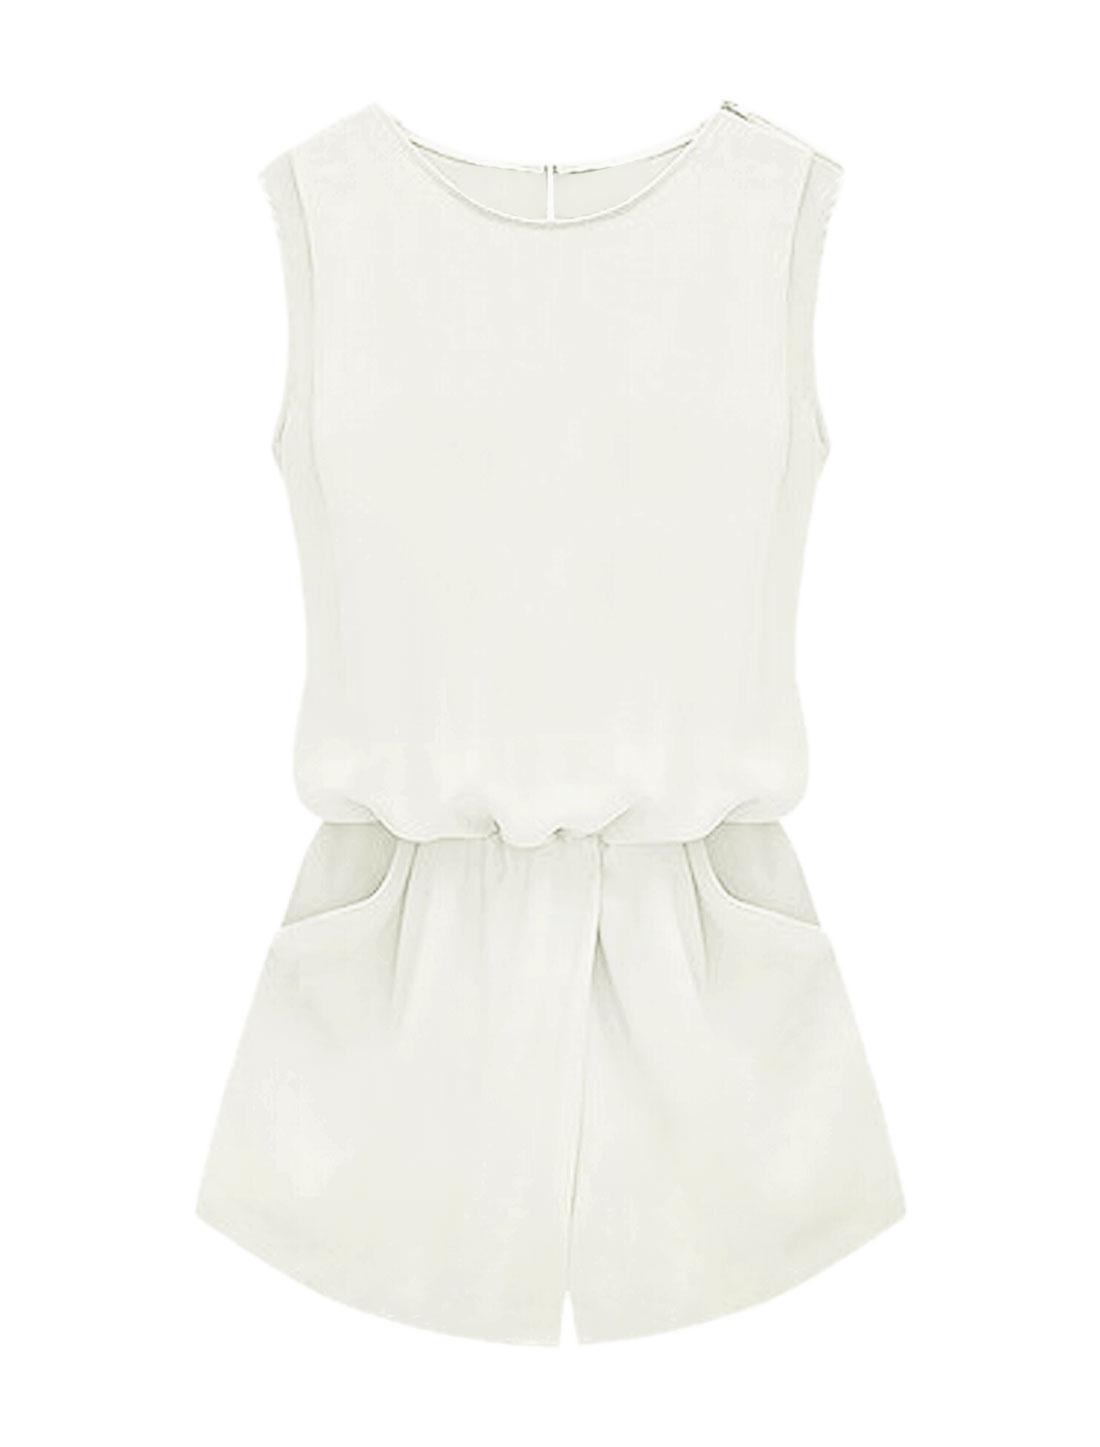 Women Sleeveless Cut Out Back Elastic Waist Romper White XL